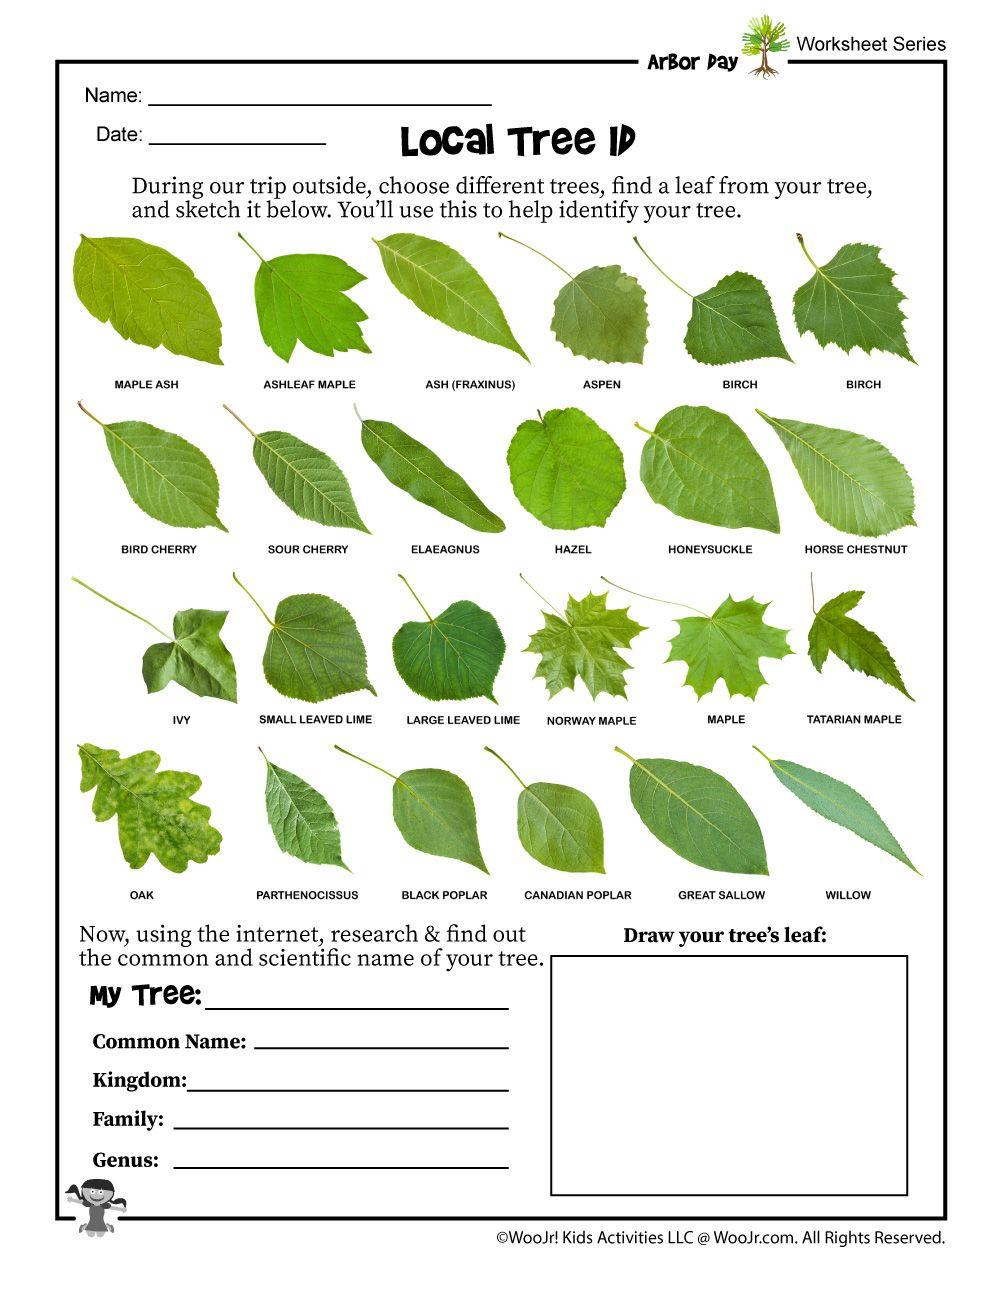 Tree Identification Worksheet Woo Jr Kids Activities In 2020 Tree Identification Arbour Day Trees For Kids